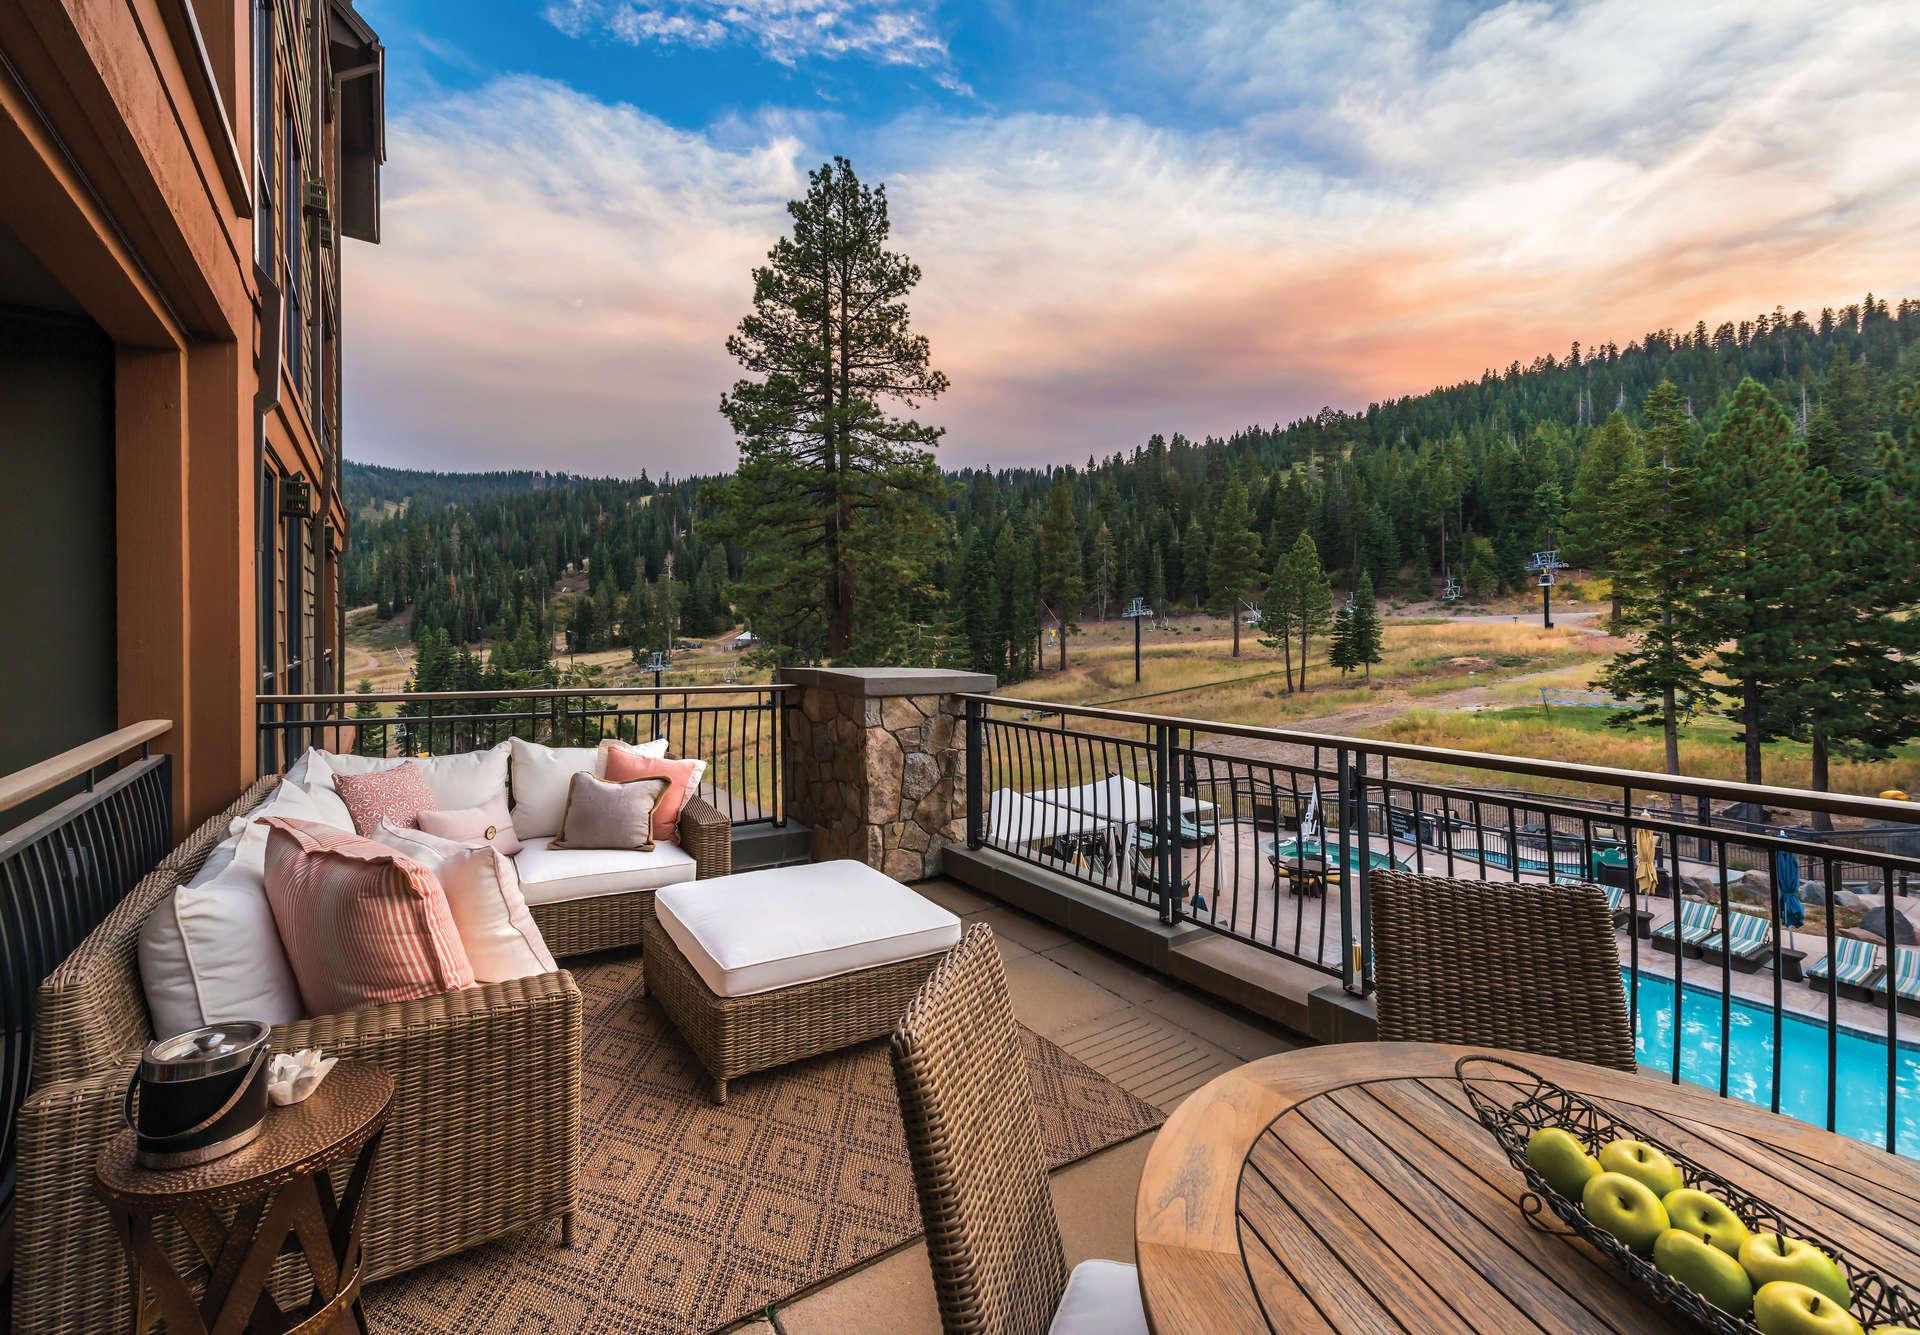 Luxury vacation rentals usa - California - Lake tahoe ca - The ritzcarlton lake tahoe - 3 BDM Slopeside Residence - Image 1/10